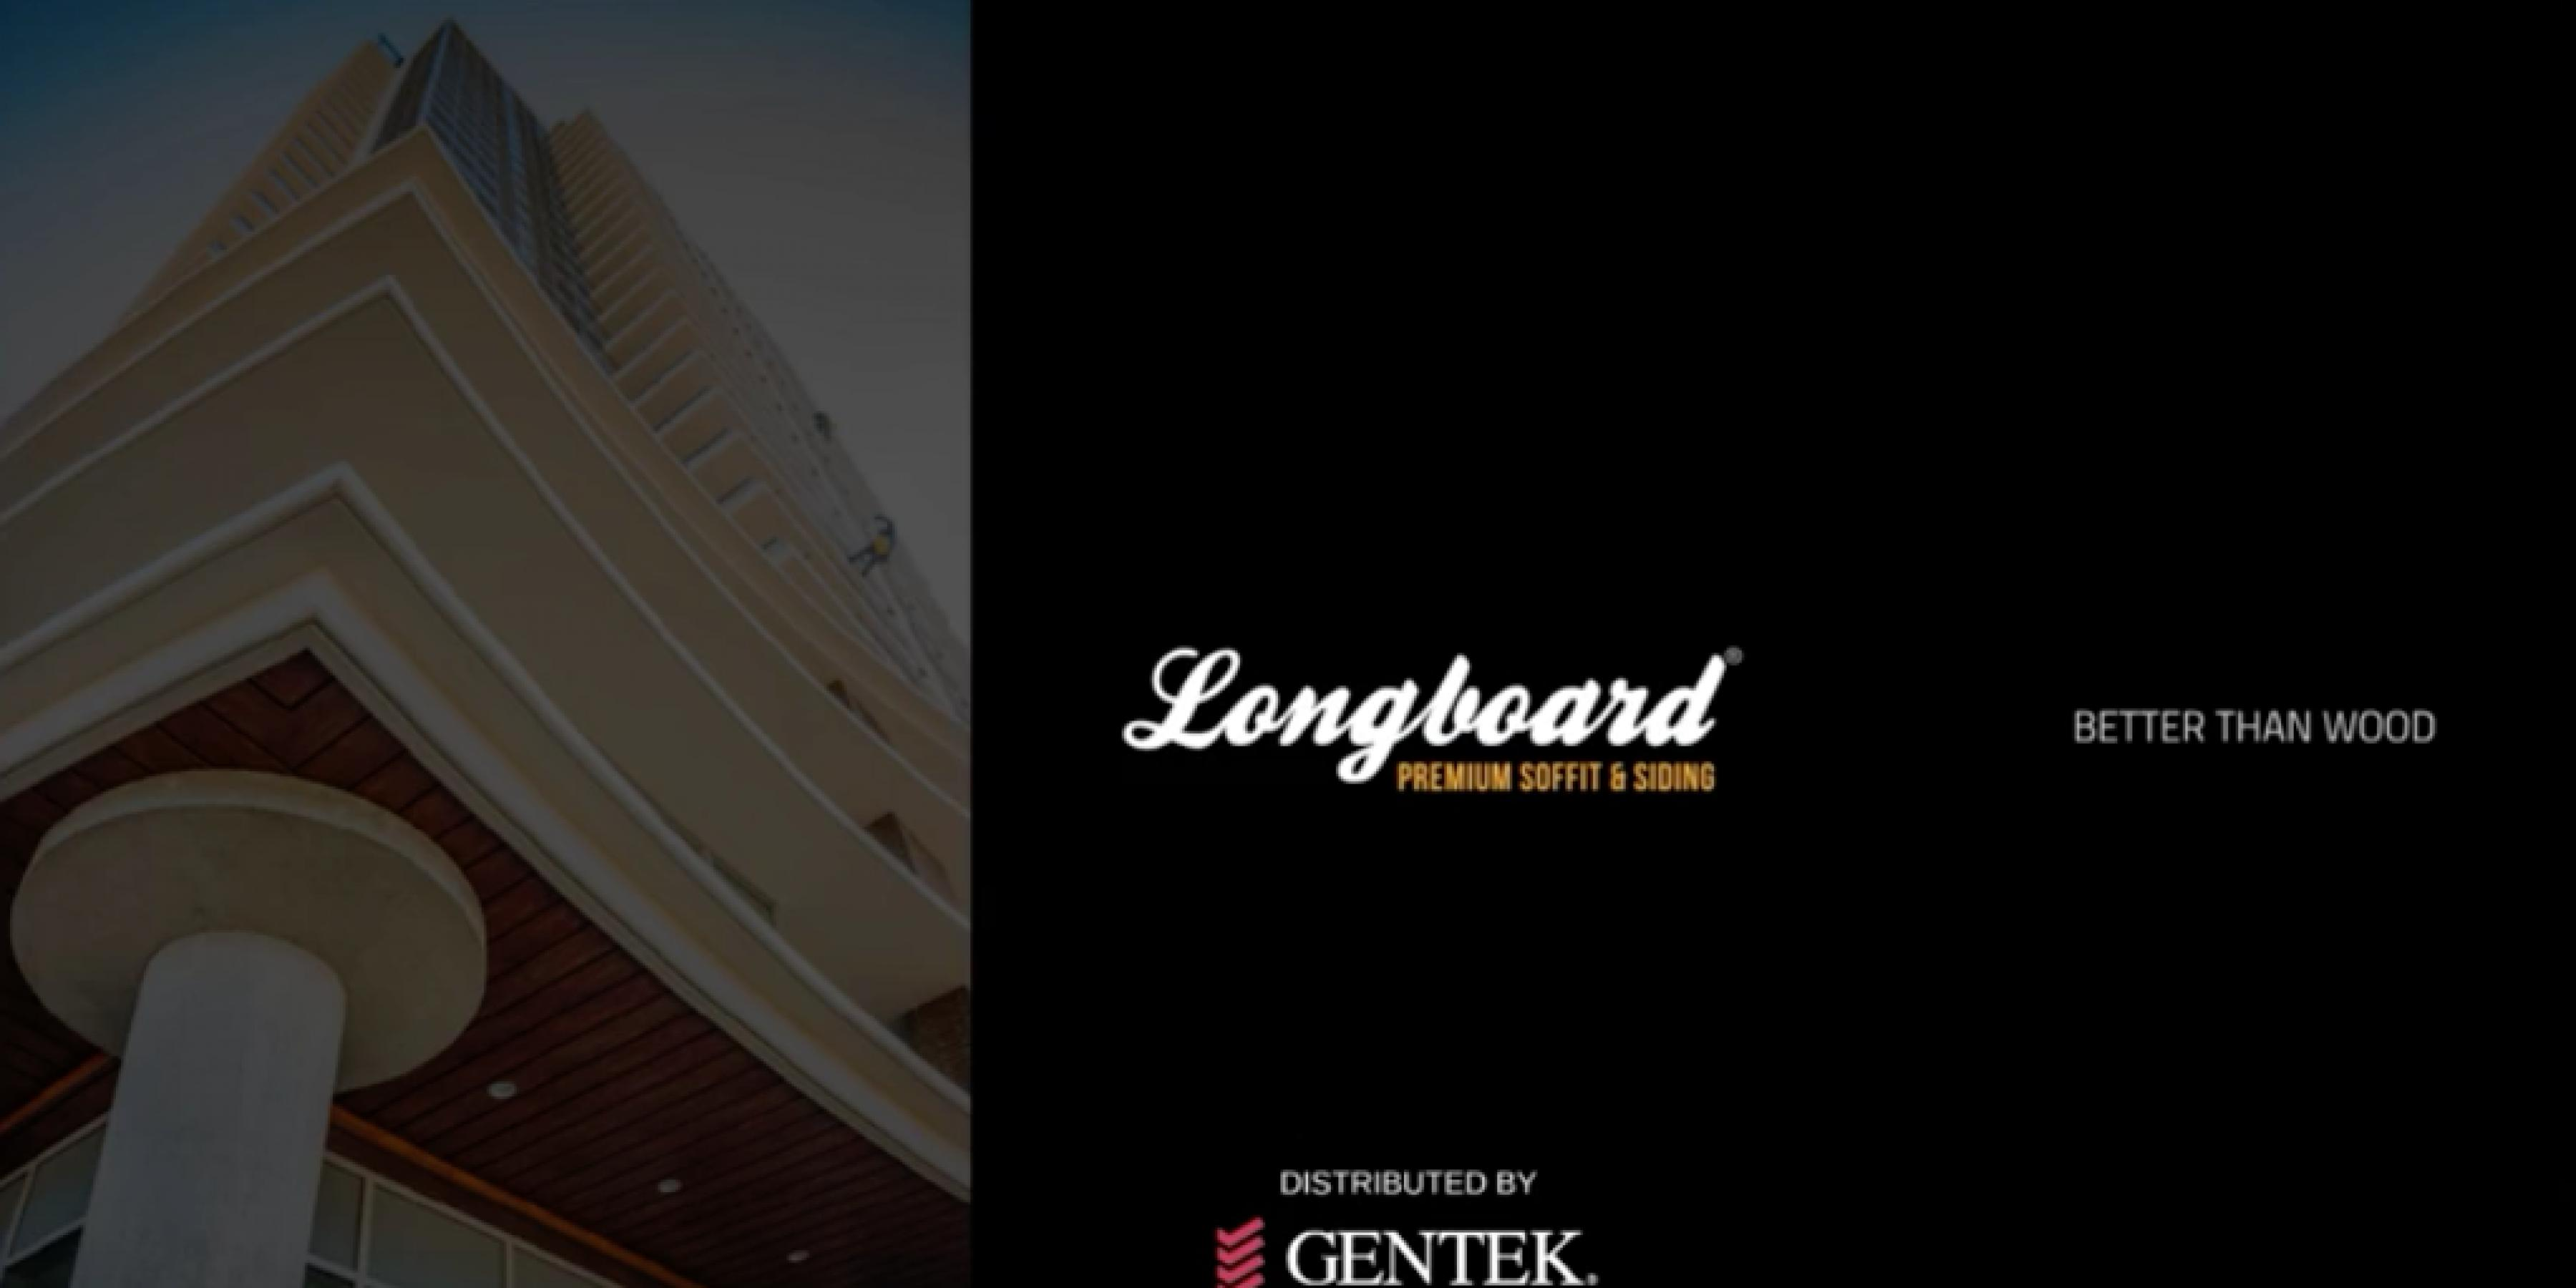 Gentek® Longboard- Premium Soffit & Siding